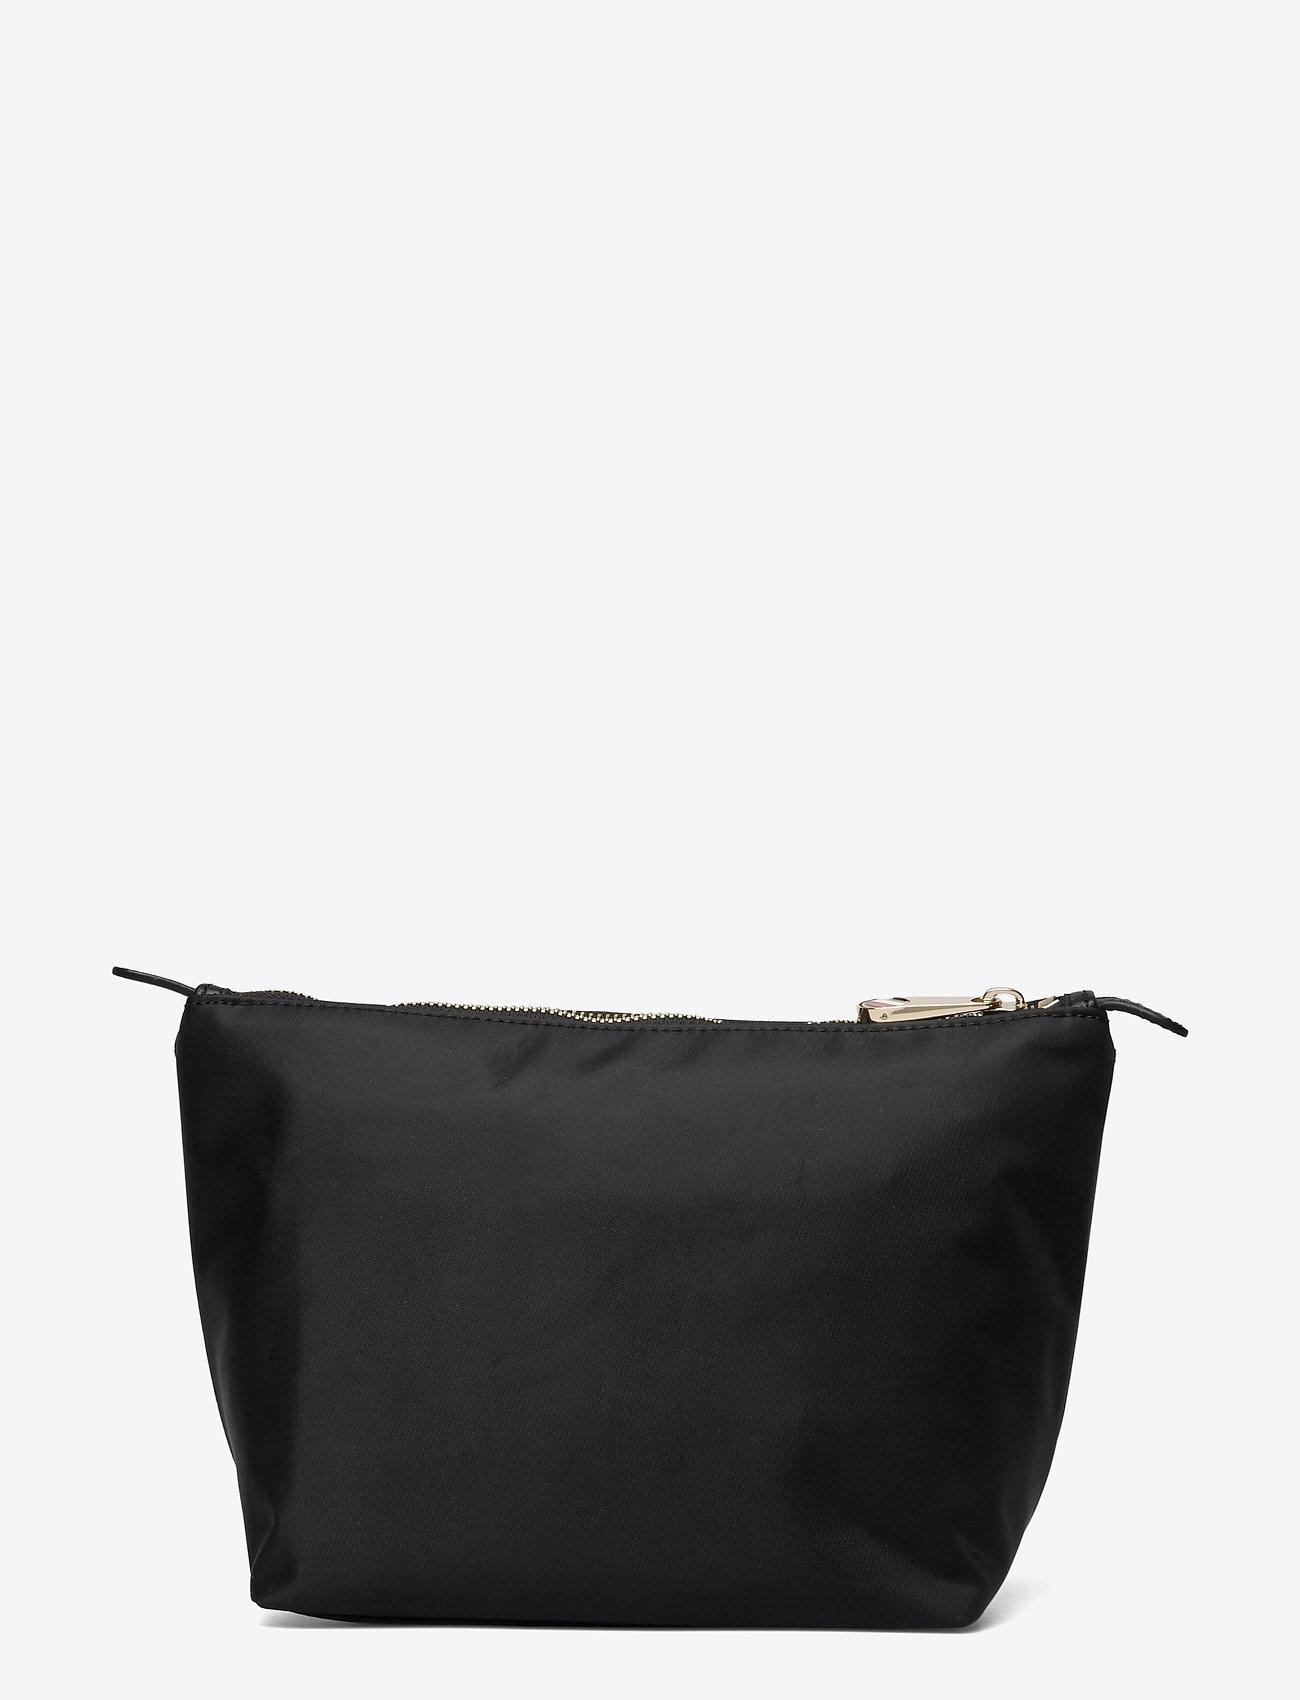 Tommy Hilfiger - POPPY WASHBAG - cosmetic bags - black - 1